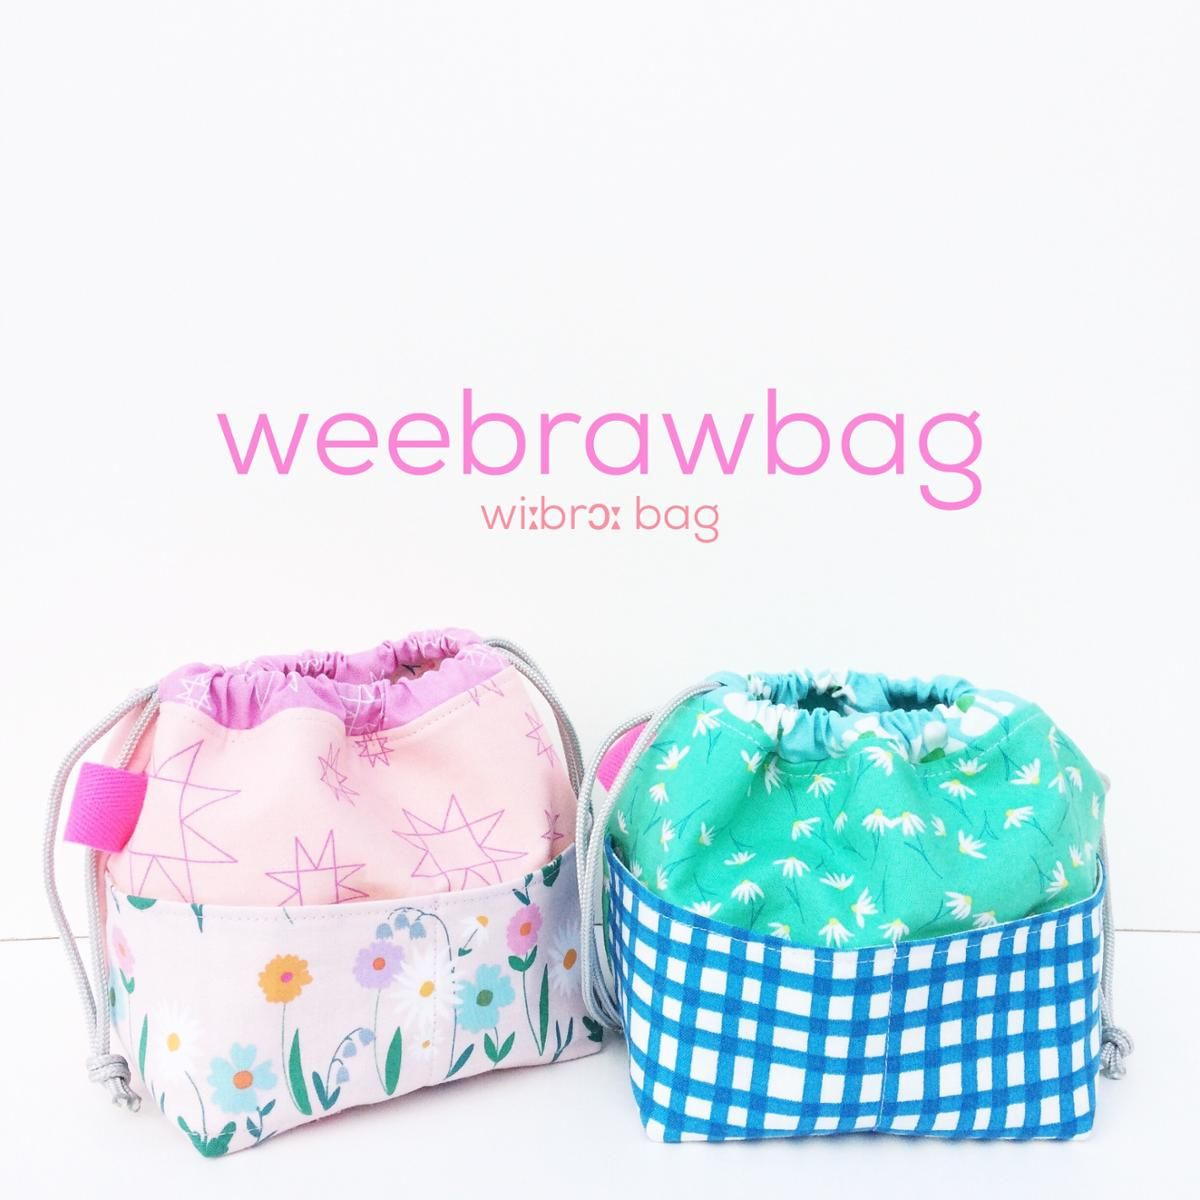 Weebrawbag | Craft show winners | Pinterest